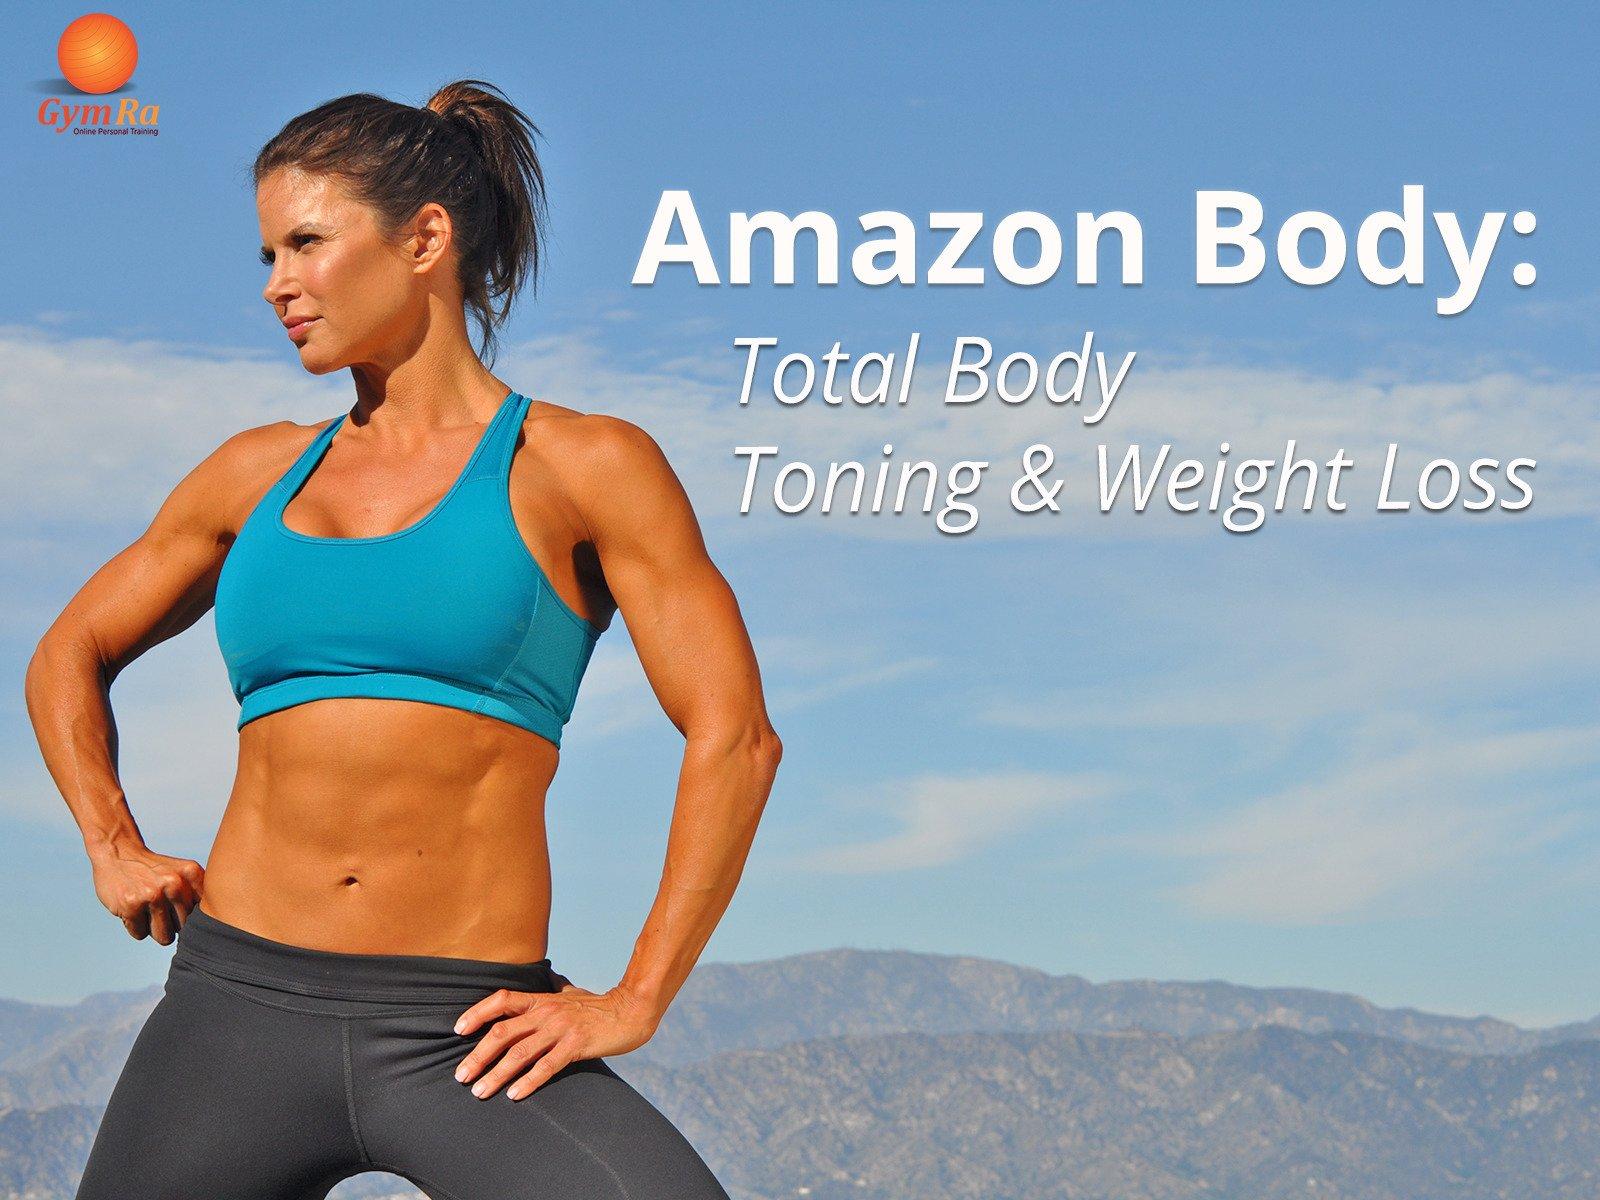 Amazon Body - Season 1